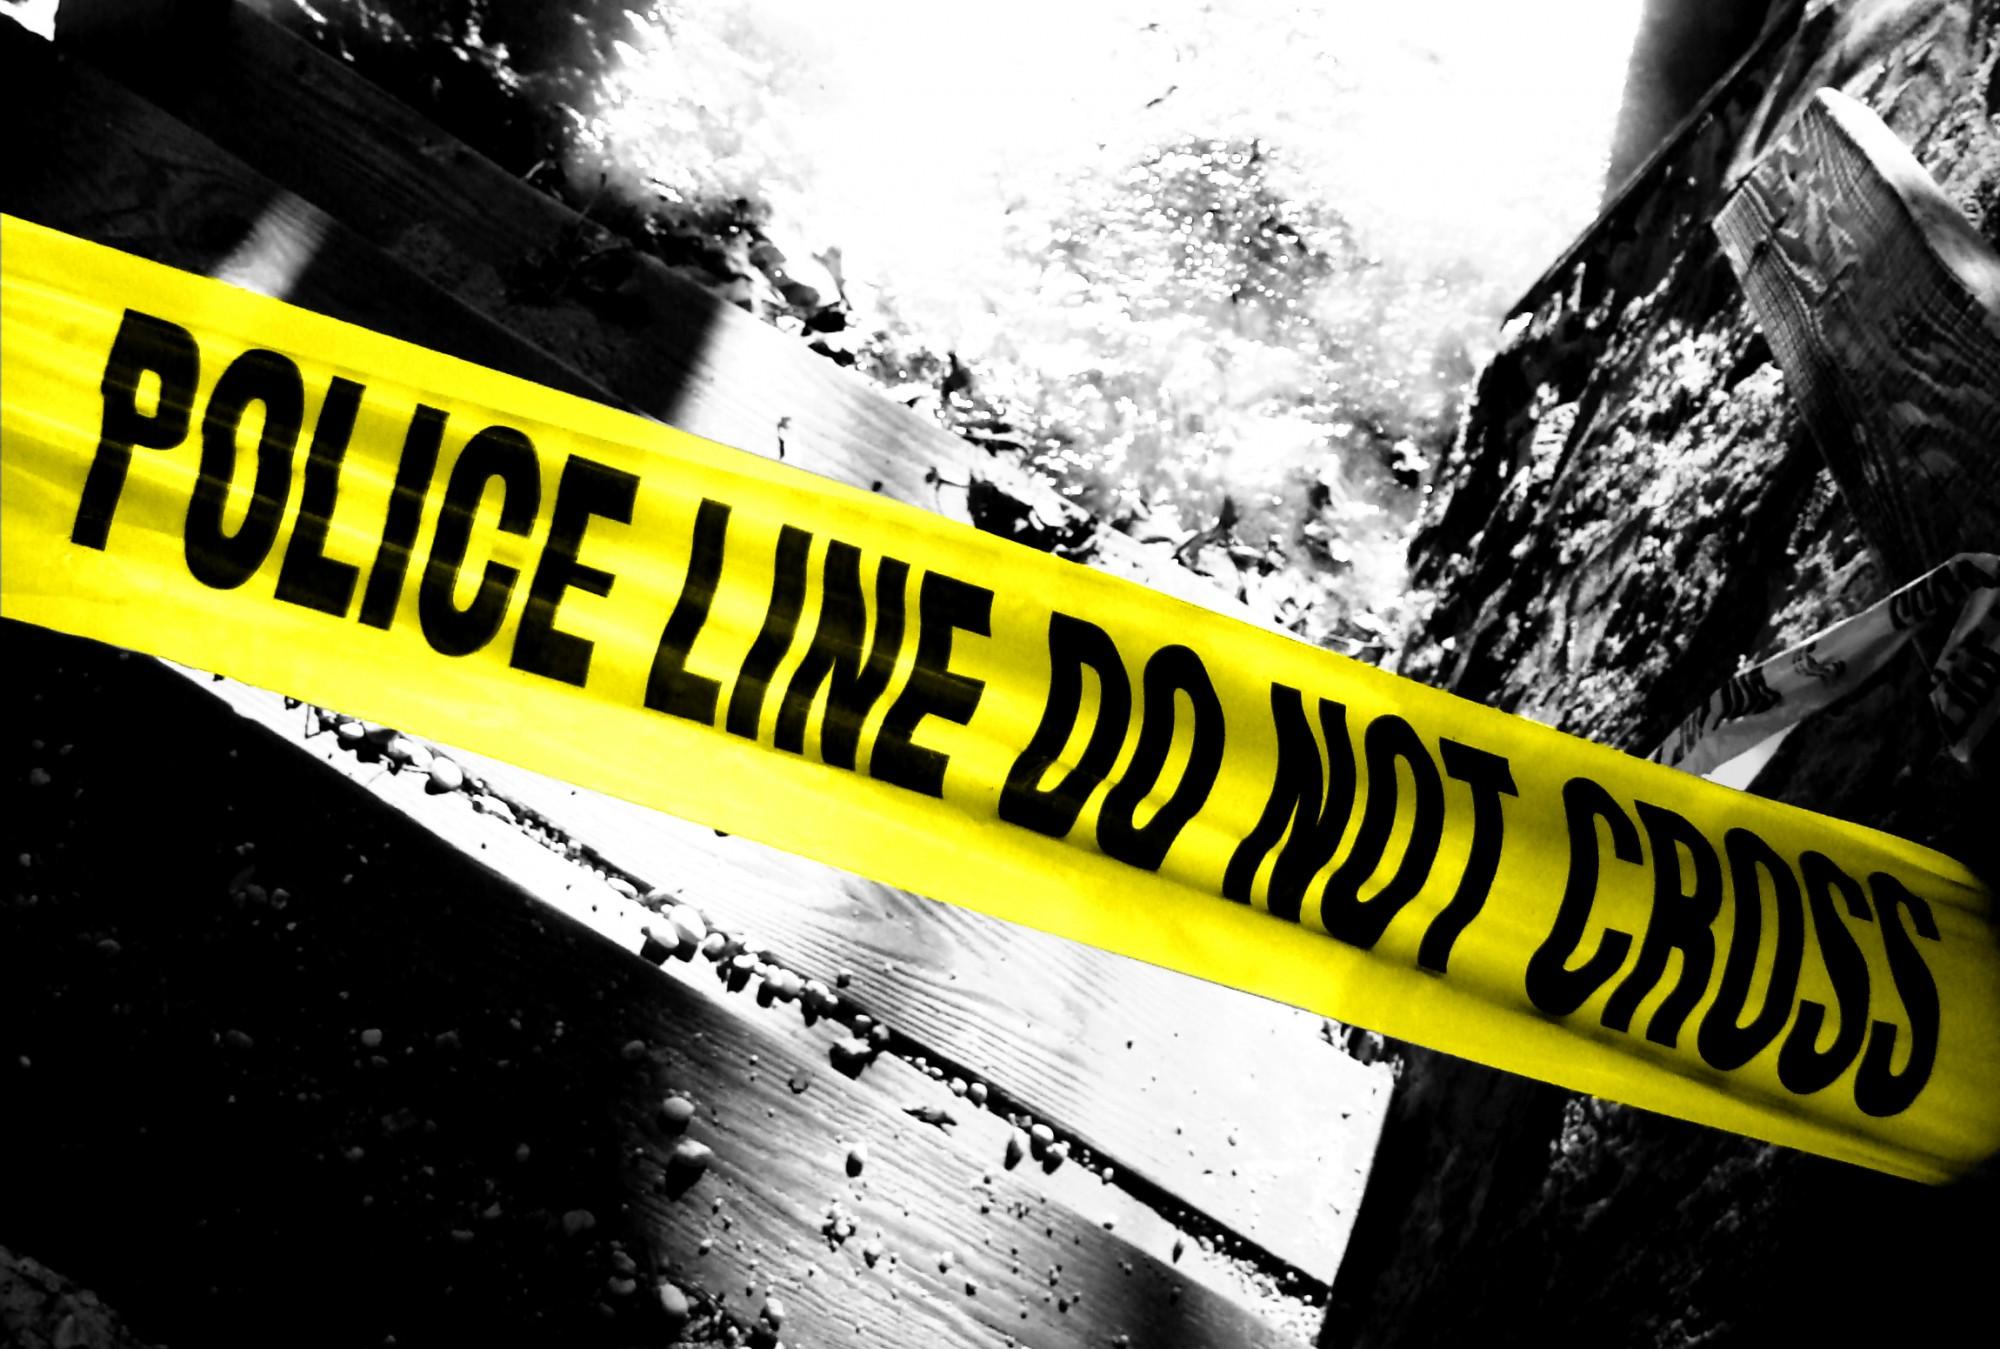 MAN KILLED IN POSSIBLE SHOOTING IN WEST EDMONTON